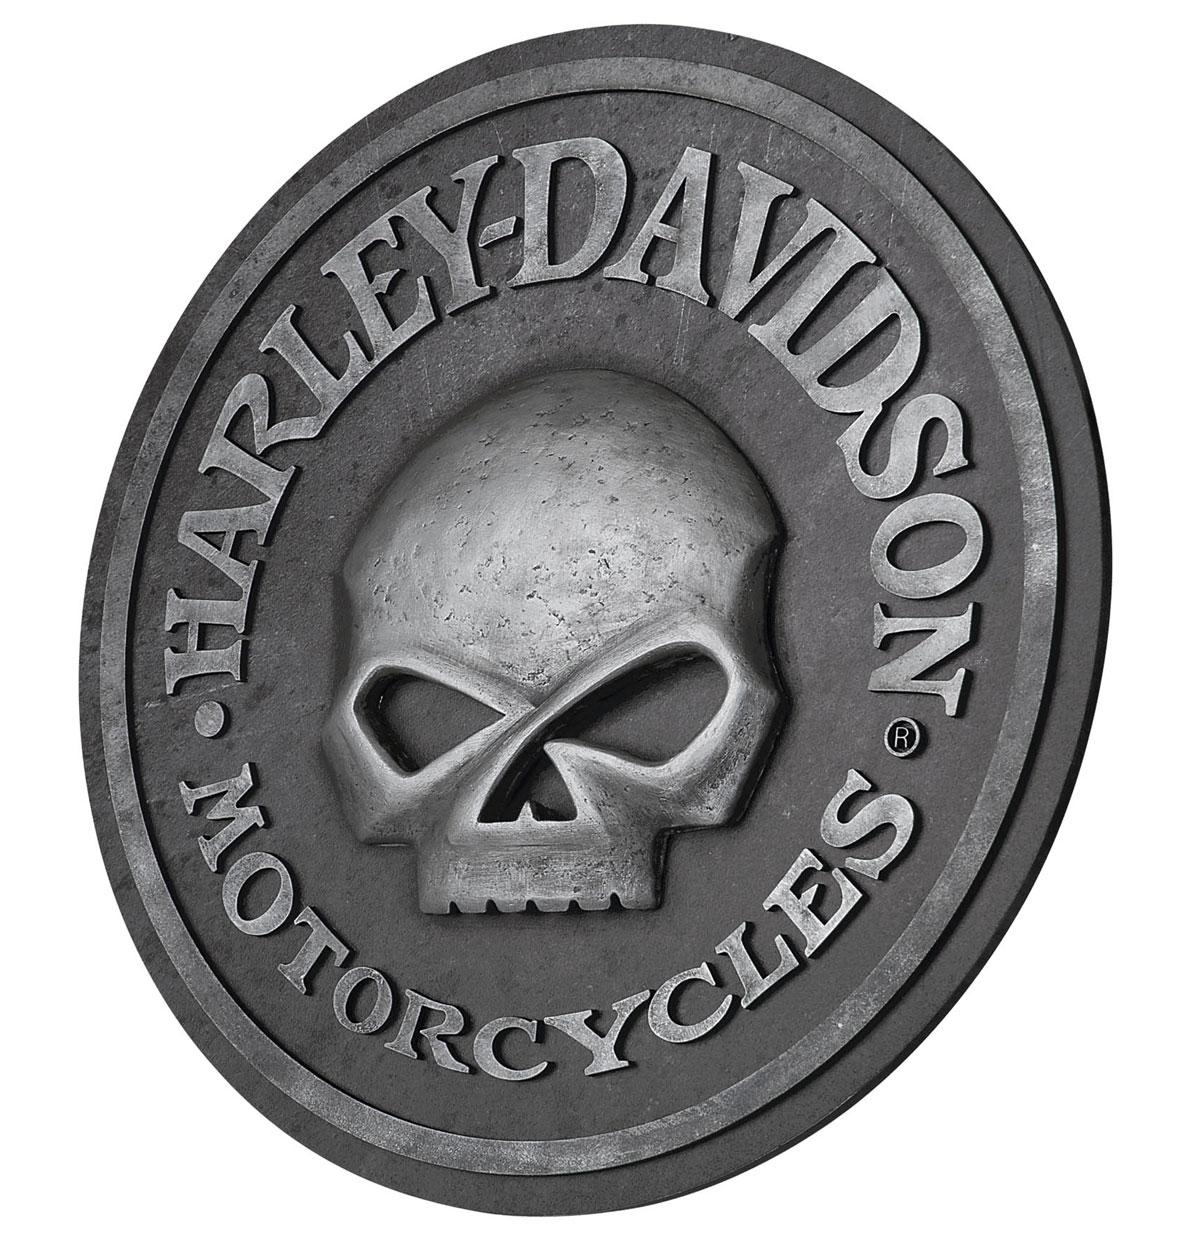 Harley-Davidson Motorcycles Skull Bar Bord